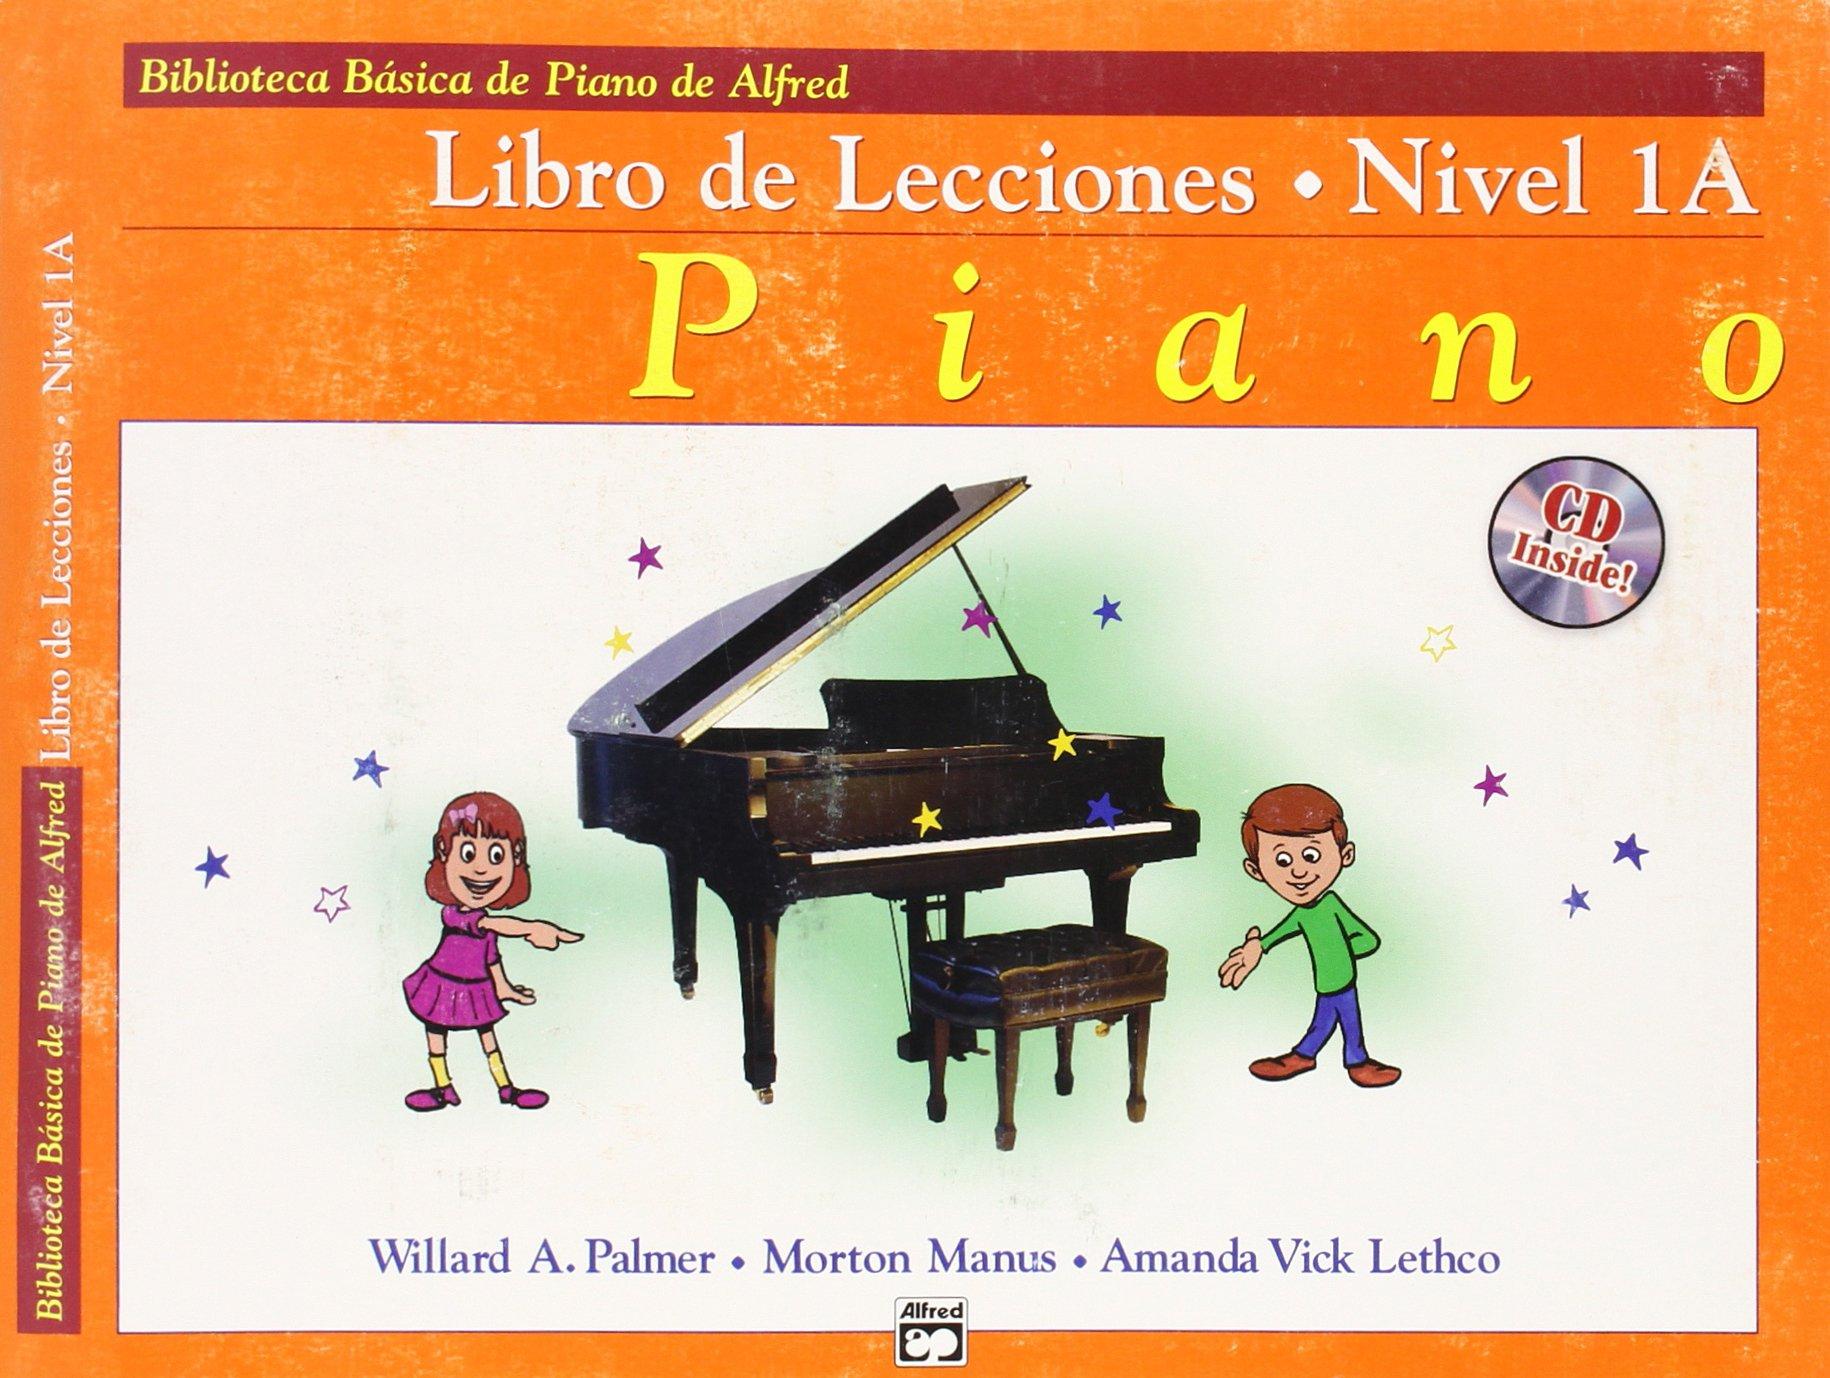 Alfreds Basic Piano Course Lesson Book, Bk 1a: Spanish Language Edition, Book & CD Biblioteca basica de piano de alfred: Amazon.es: Willard Palmer, ...